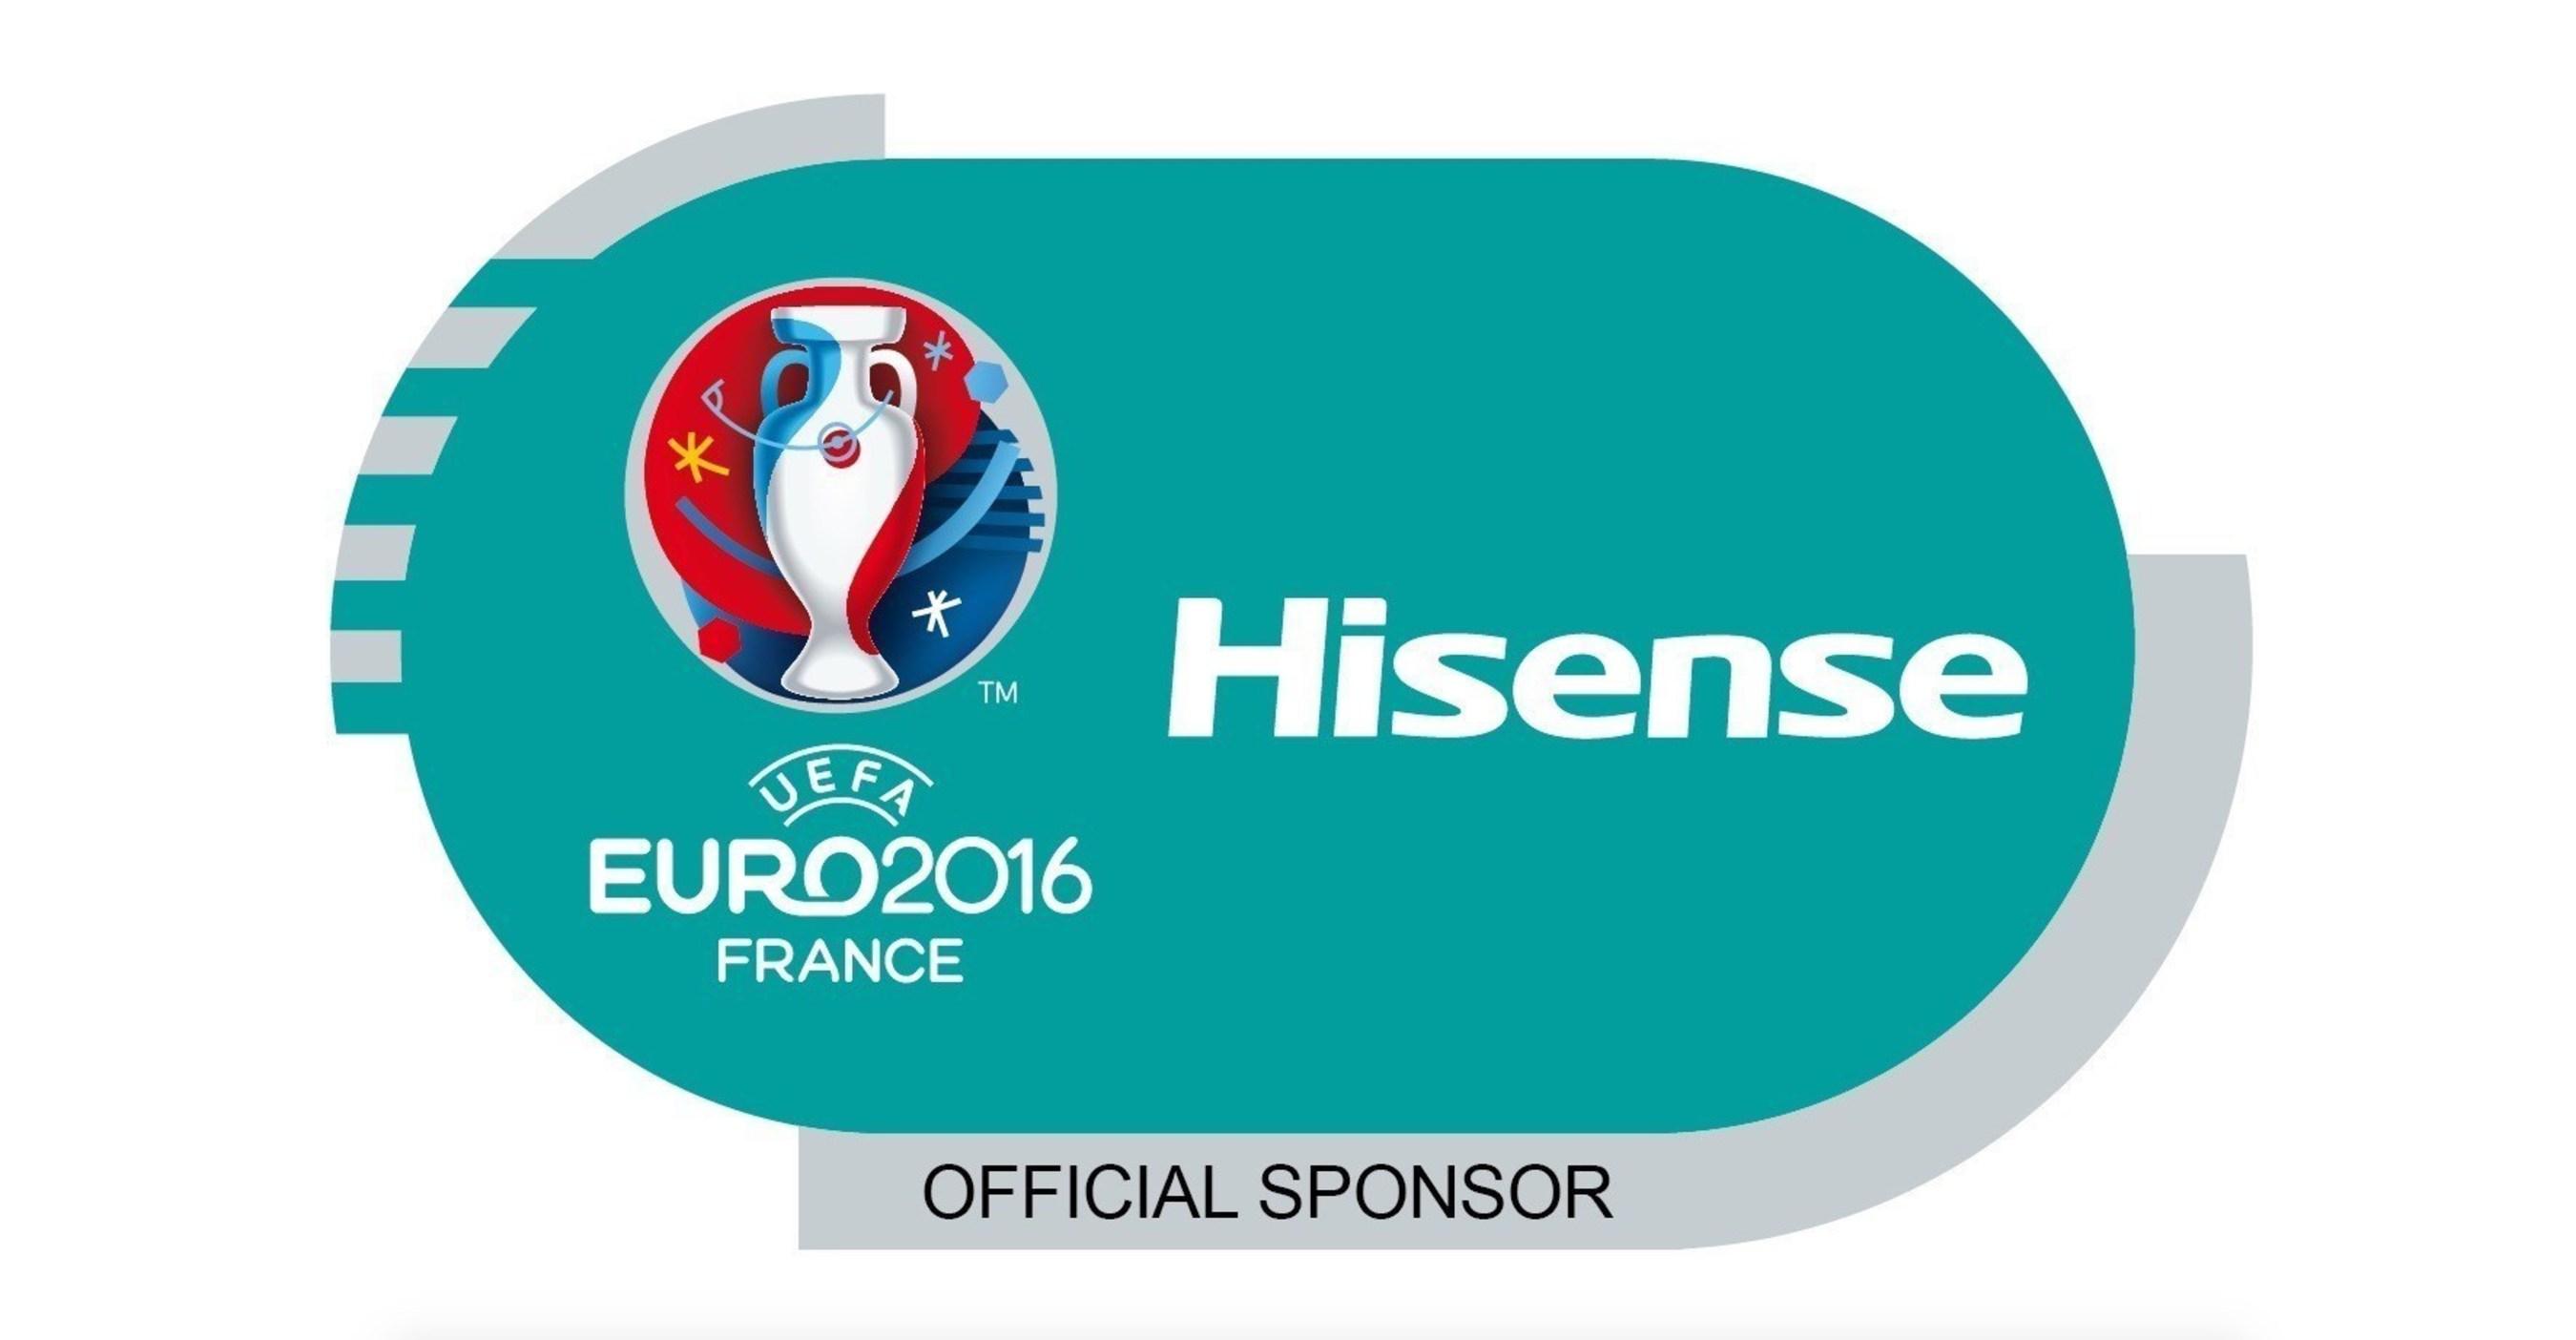 Hisense wird 10. Global Partner der UEFA-Europameisterschaft 2016